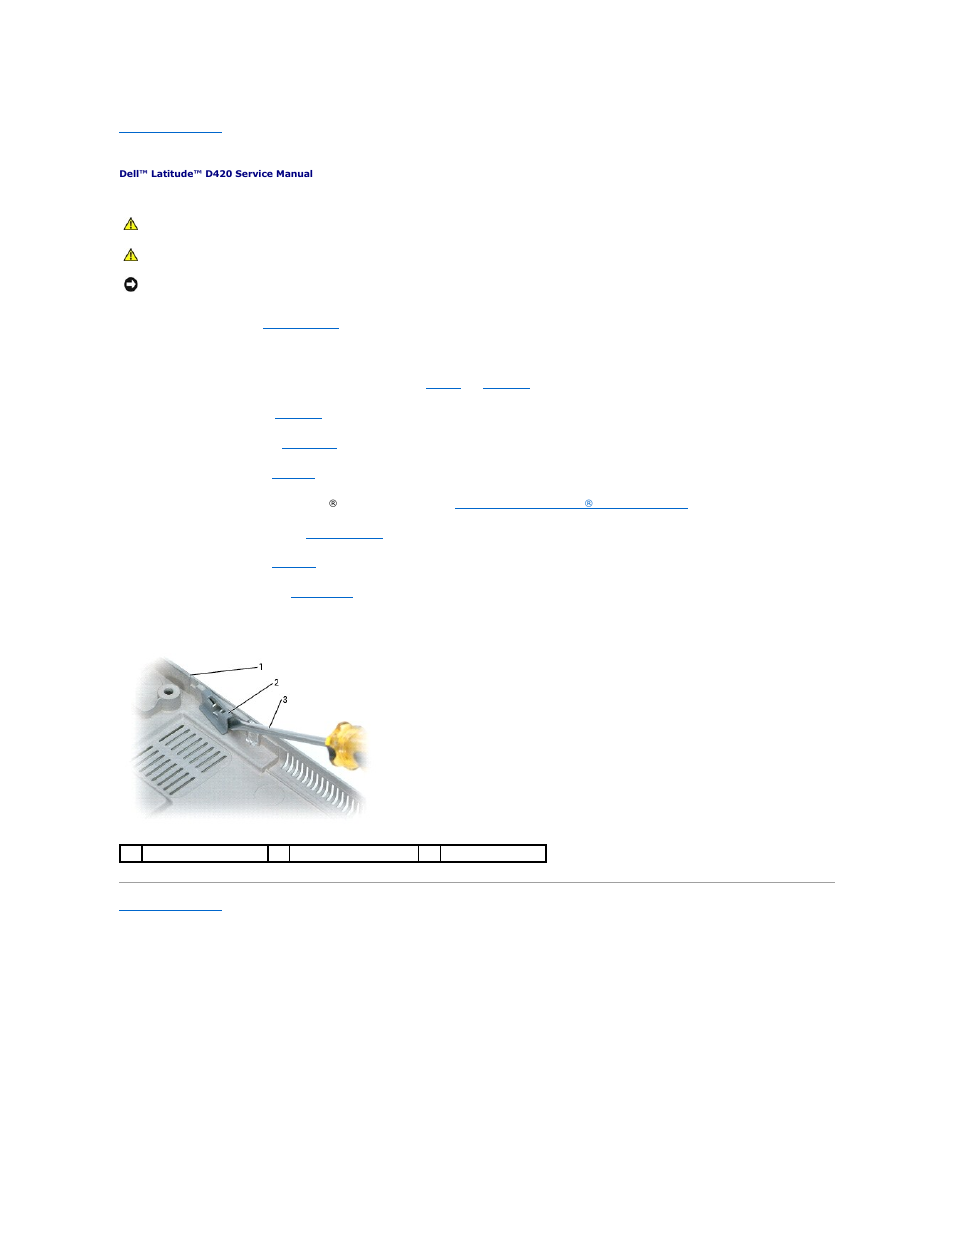 wireless switch dell latitude d420 user manual page 33 37 rh manualsdir com dell latitude d420 manual pdf Dell Latitude D520